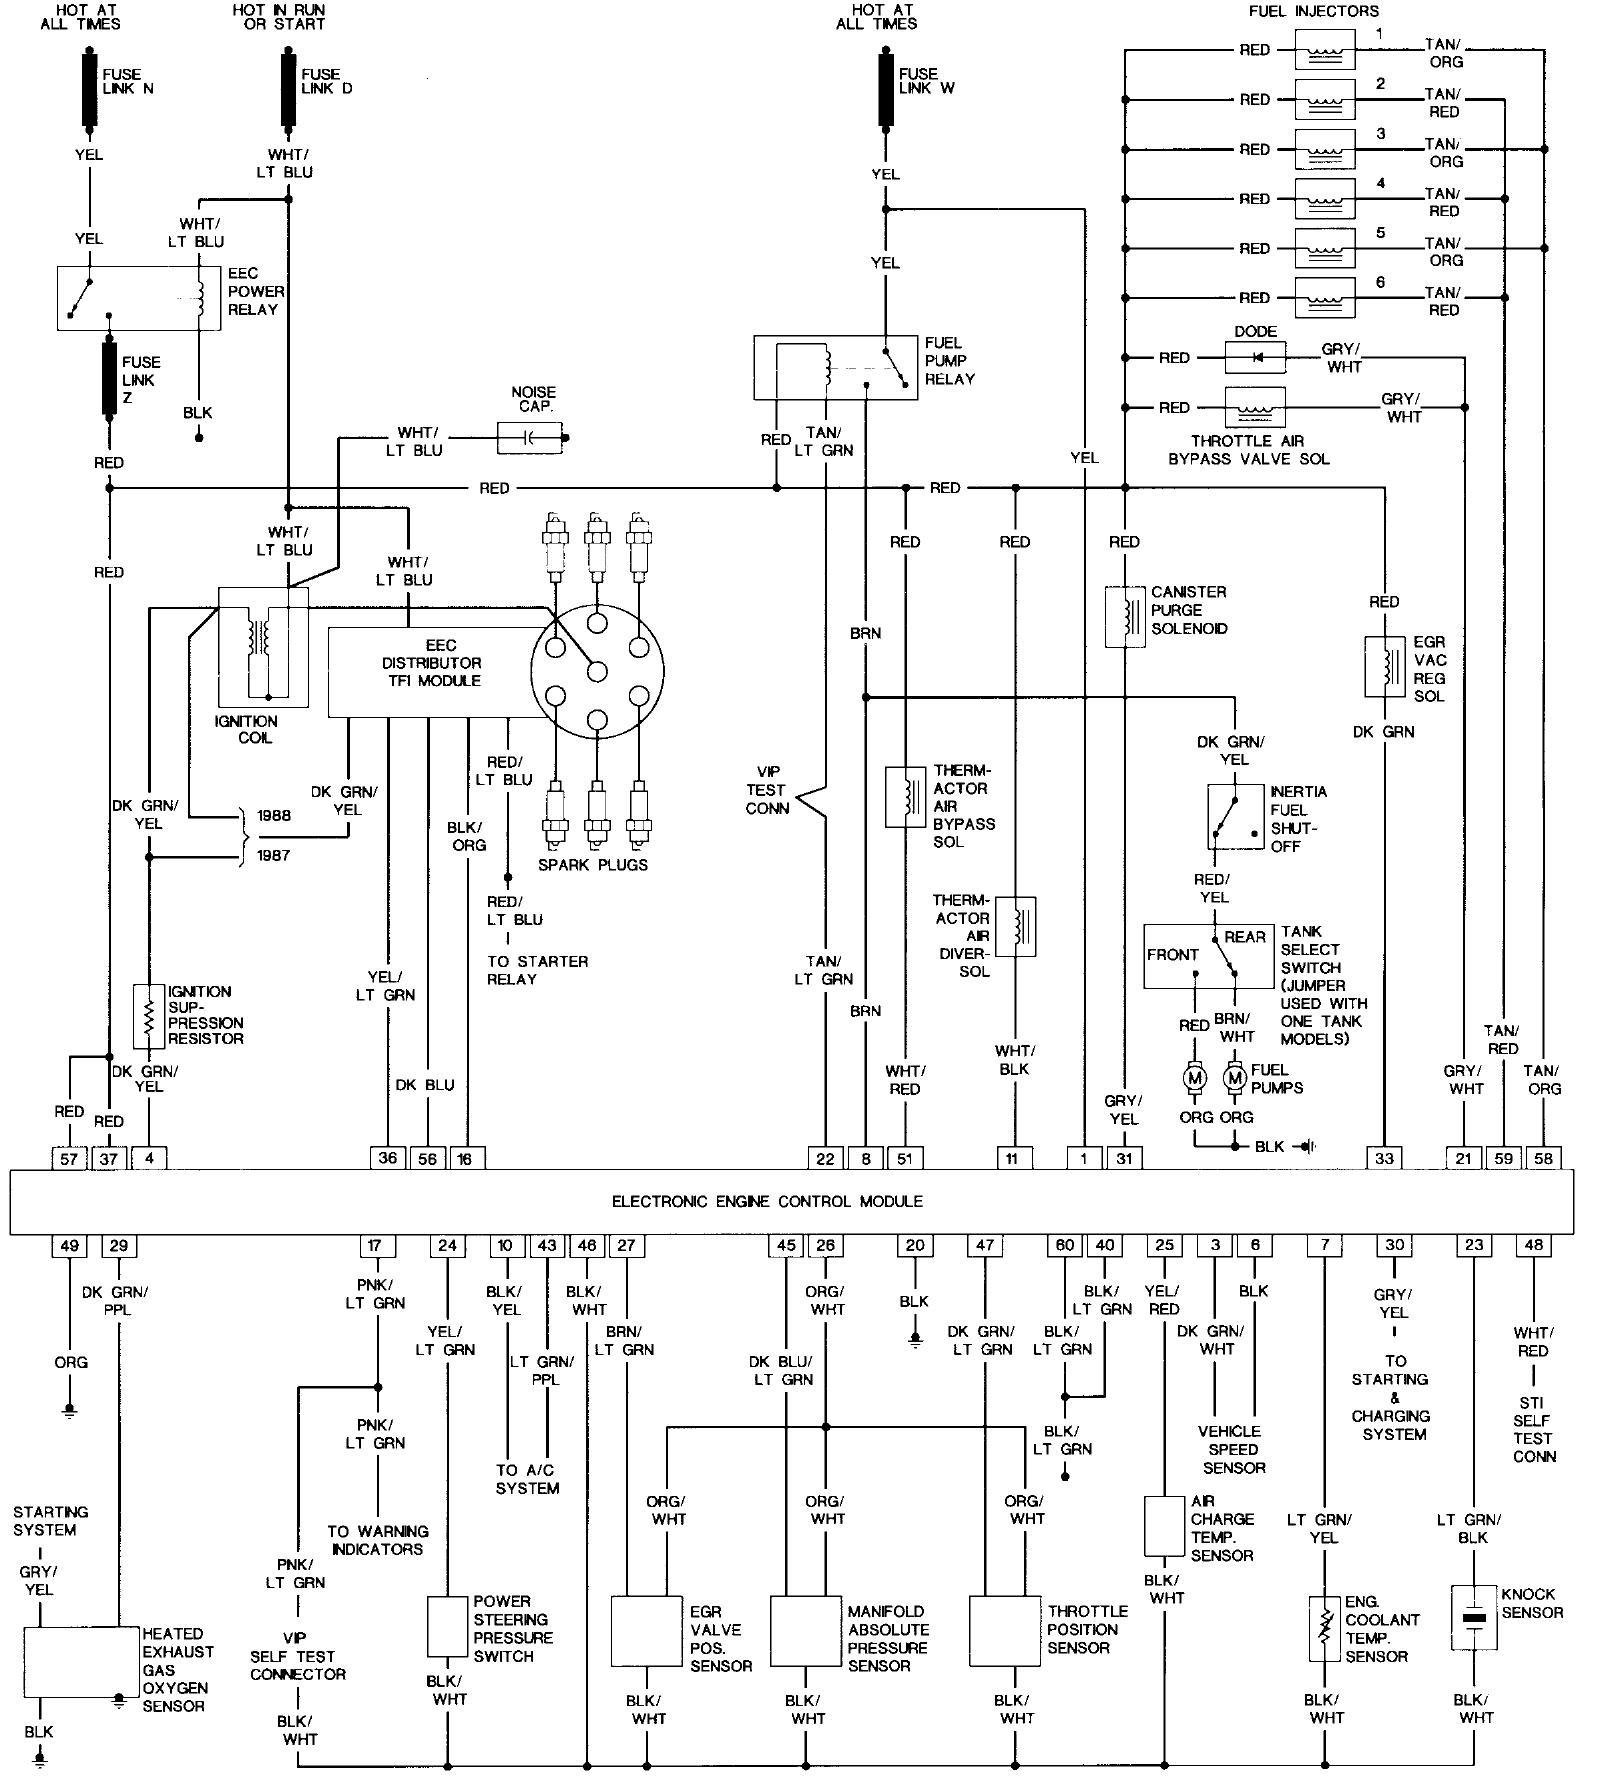 DIAGRAM] 1986 Ford F 250 Diesel Wiring Diagram FULL Version HD Quality Wiring  Diagram - LINKDIAGRAMS.CONCOURS-MEDECINE.FR Concours-medecine.fr